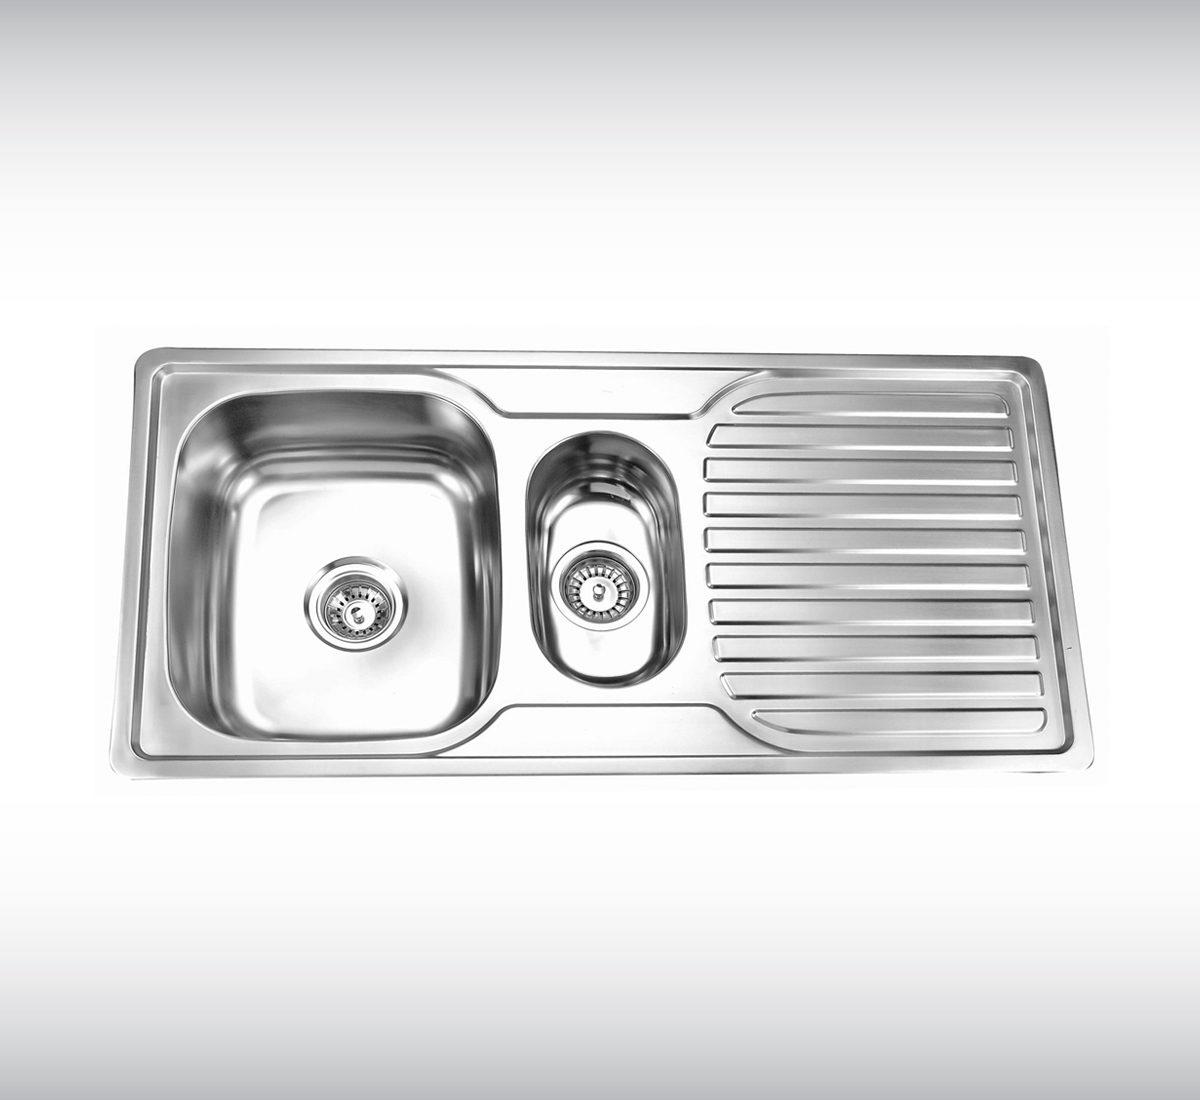 Stainless Steel Sink PERTA-150S